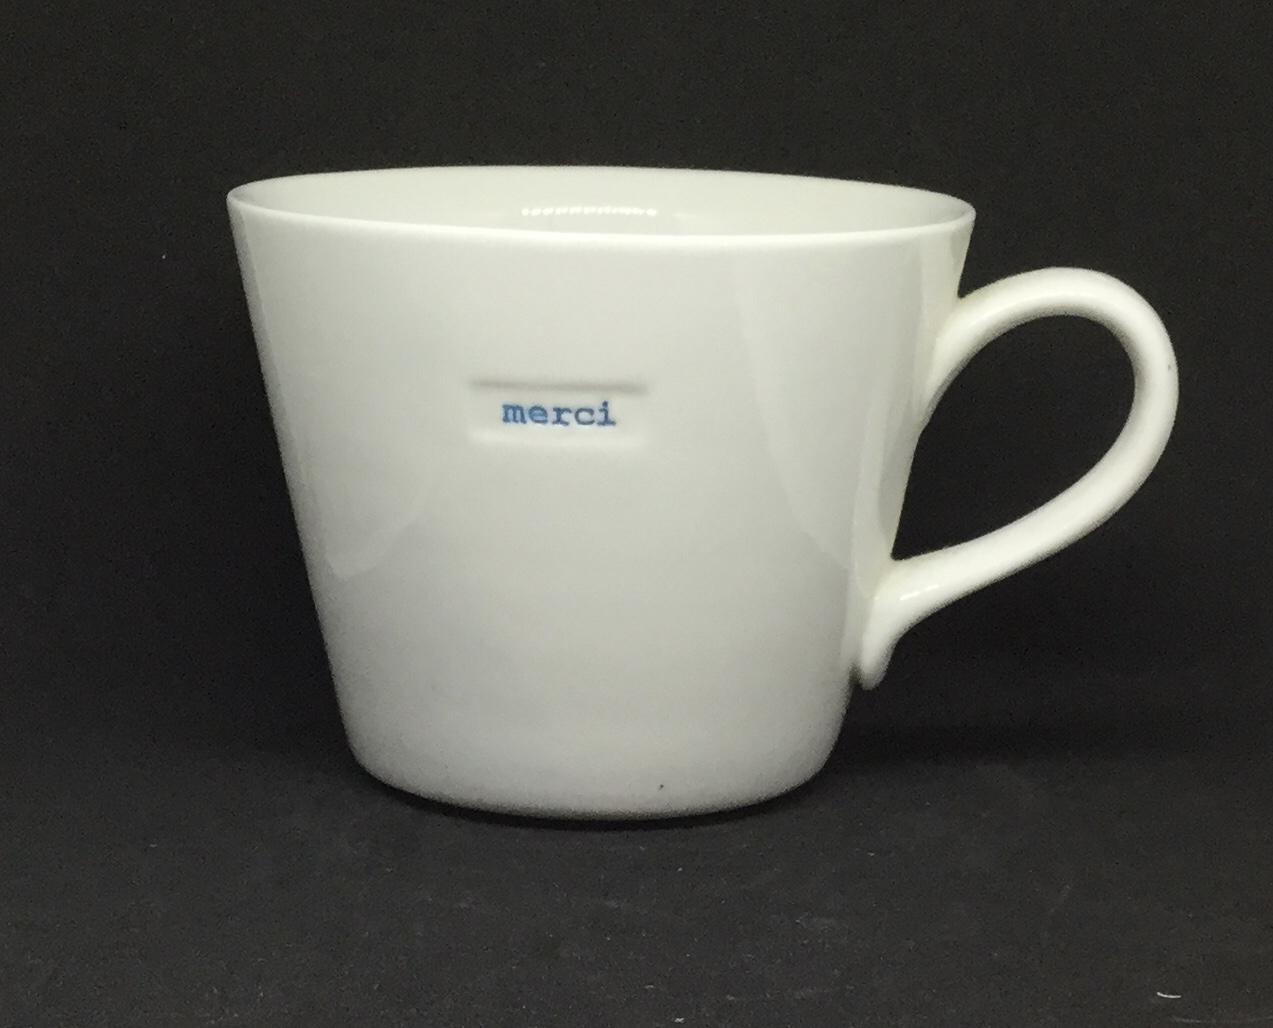 'Merci' fine bone China mug